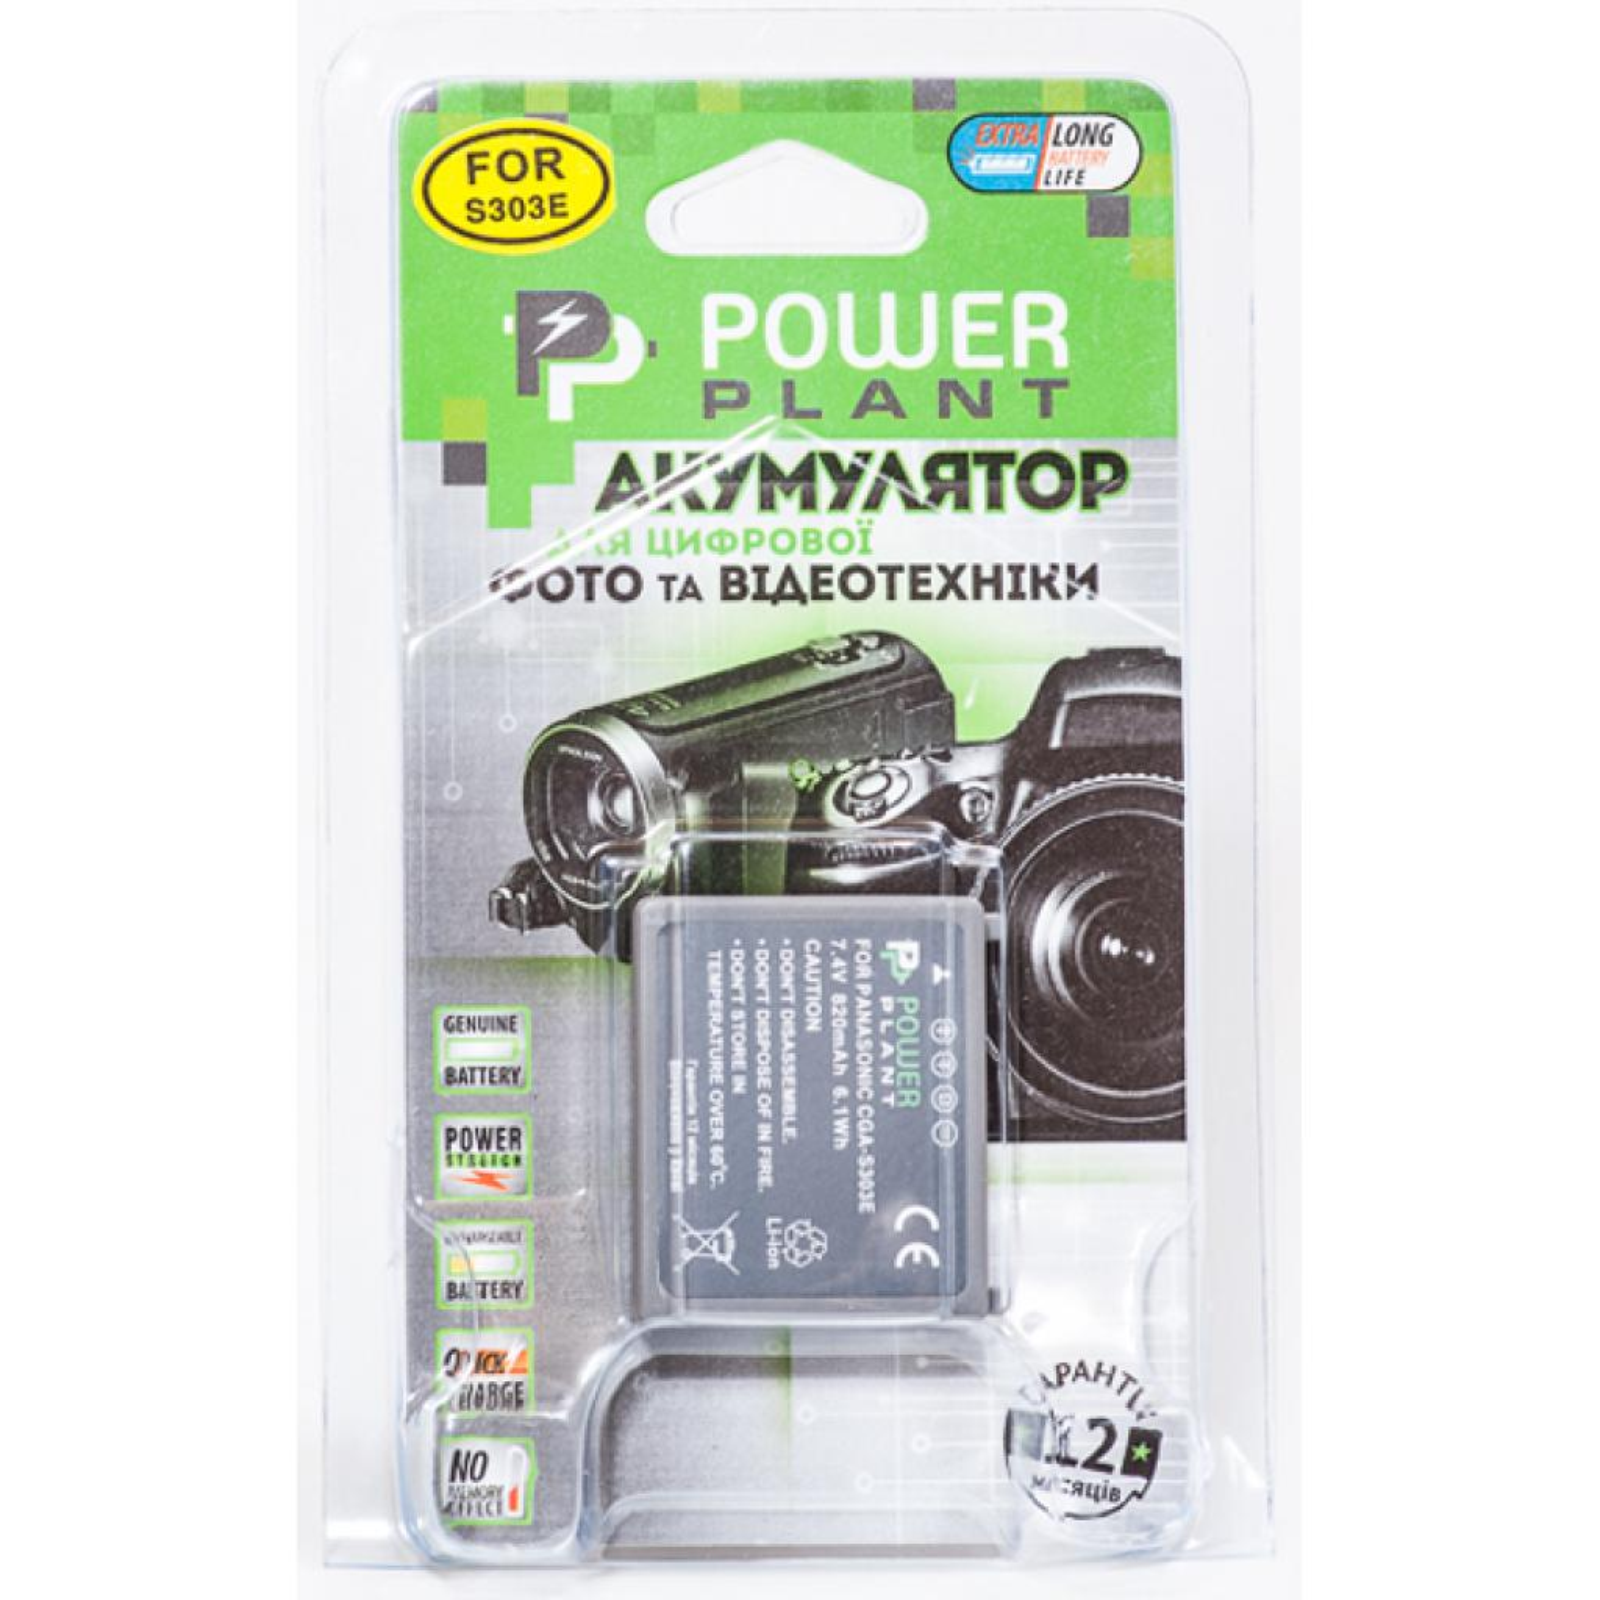 Аккумулятор к фото/видео PowerPlant Panasonic VW-VBE10, CGA-S303 (DV00DV1341) изображение 3